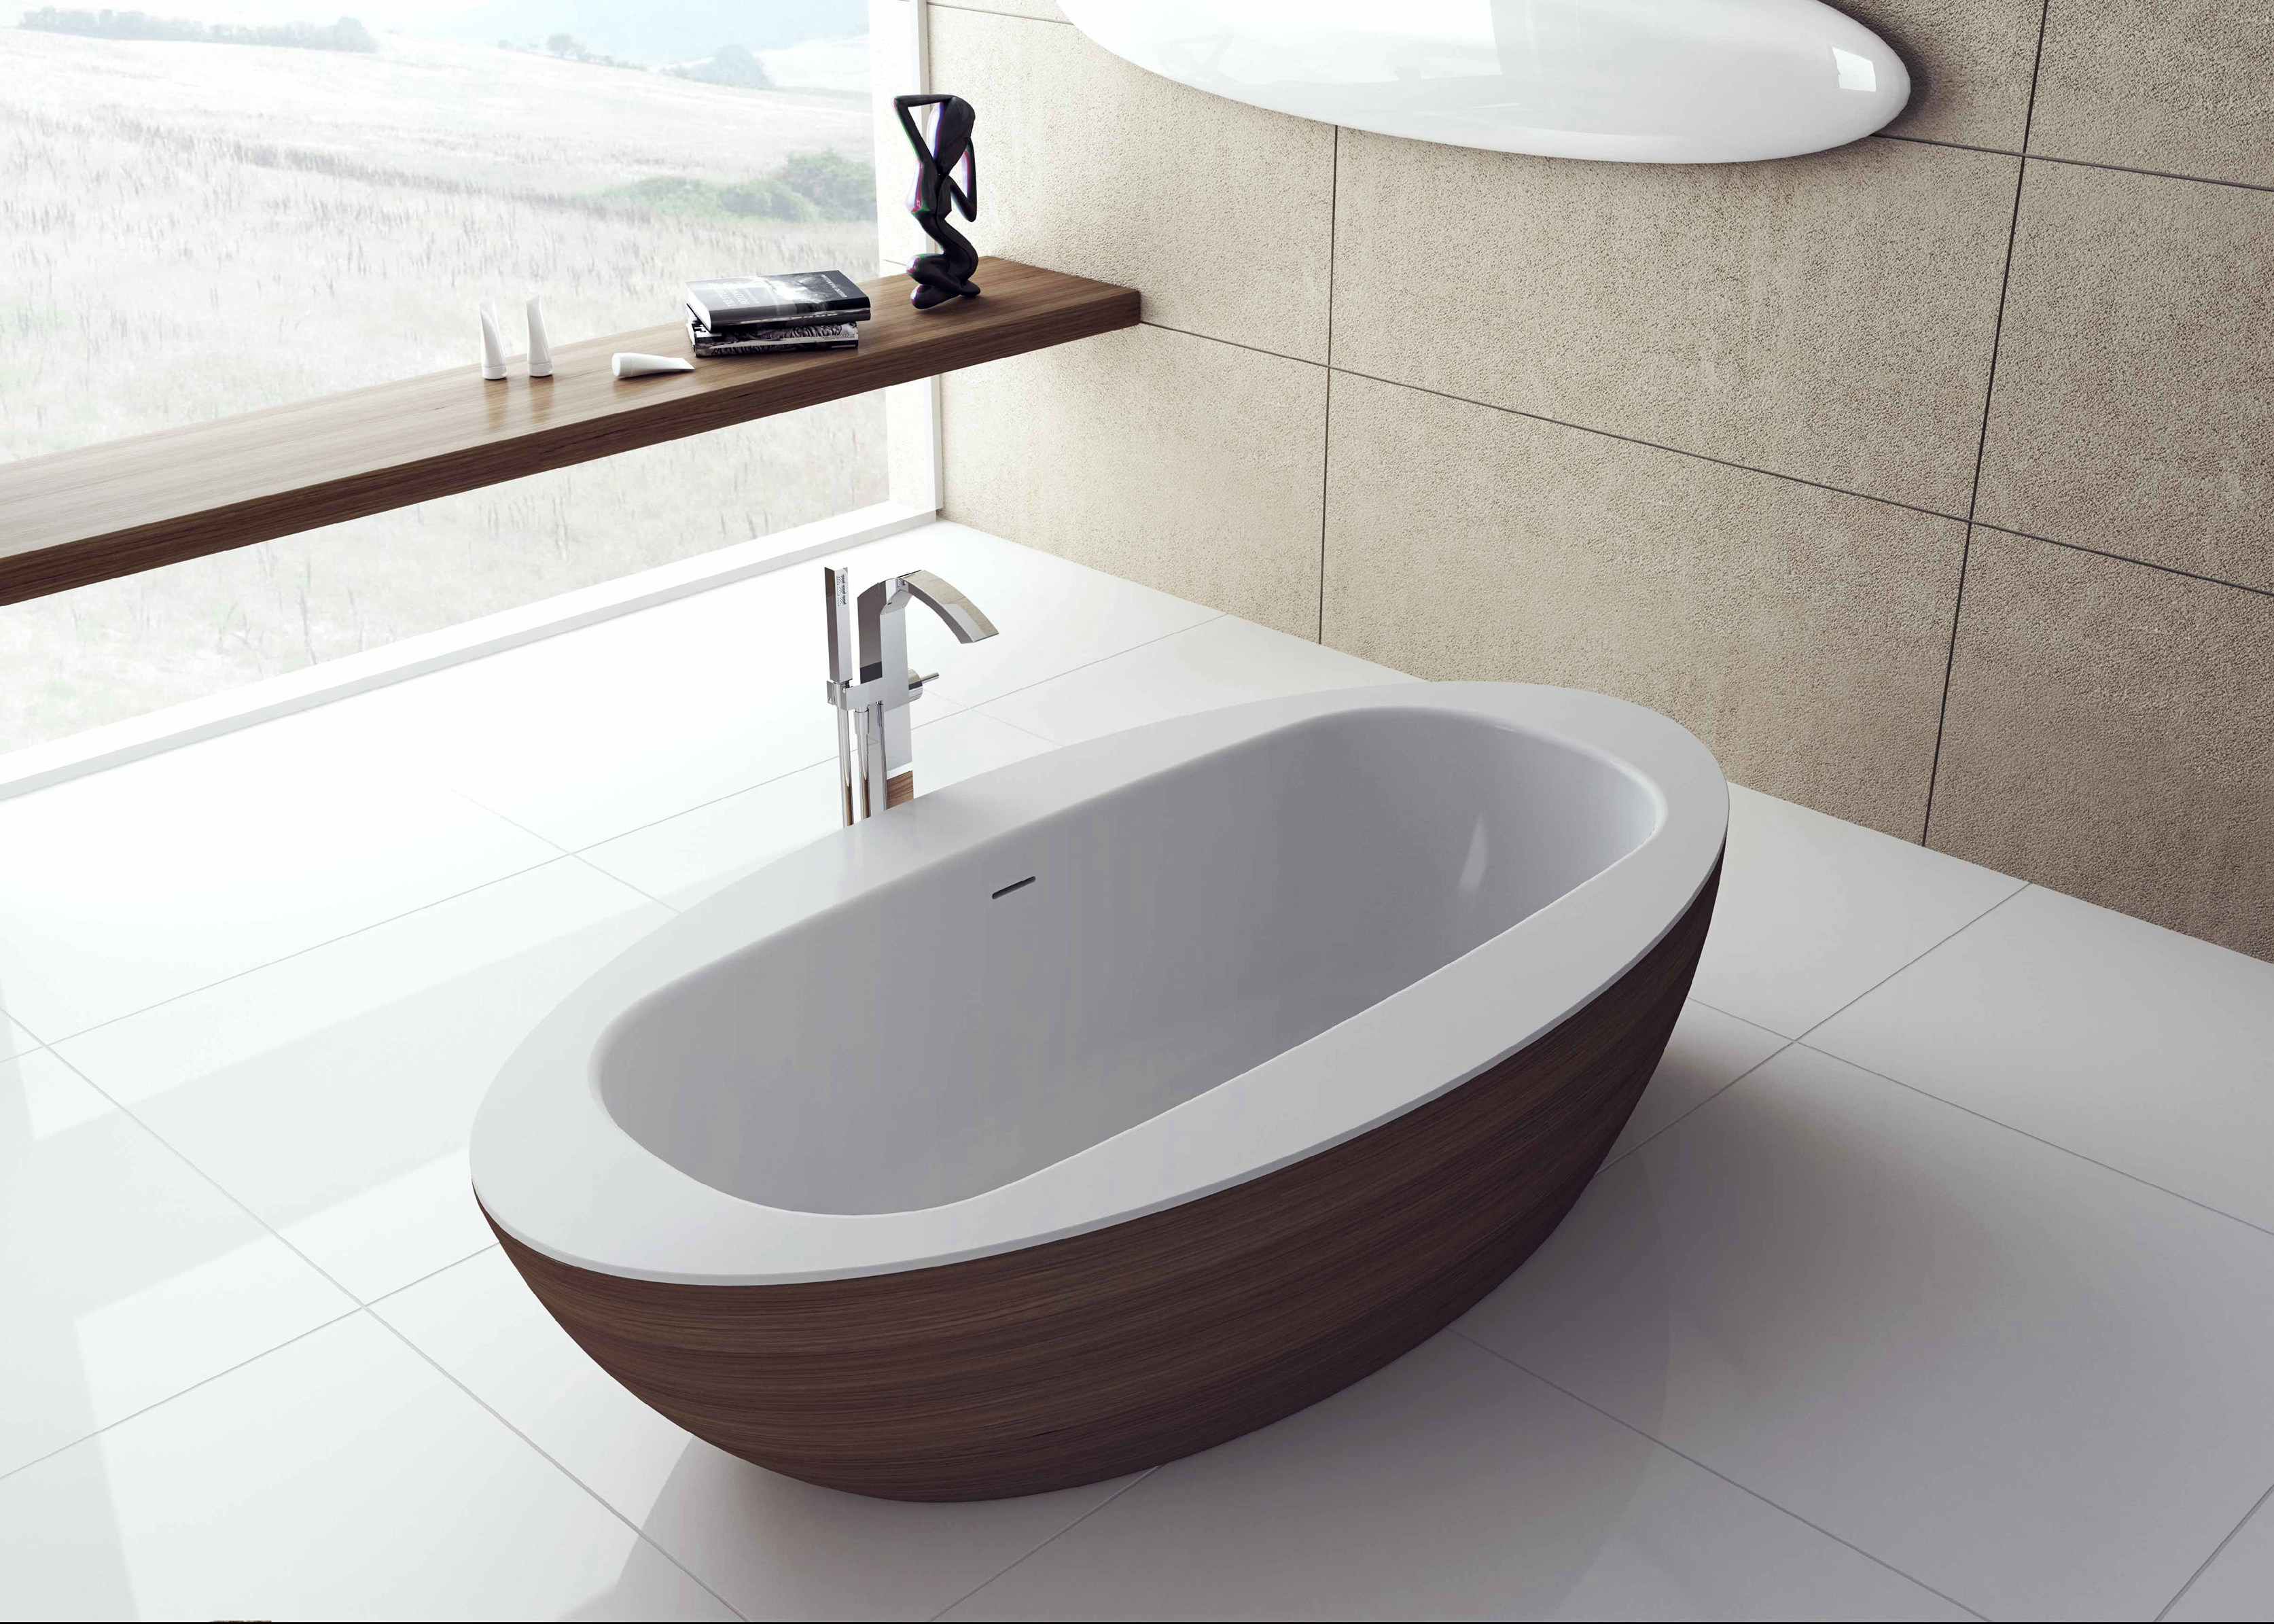 100 Alegna Bathtubs Laguna Basic Flexibel Und Sanft Geschwungen U2013 Alegna A New Bathtub